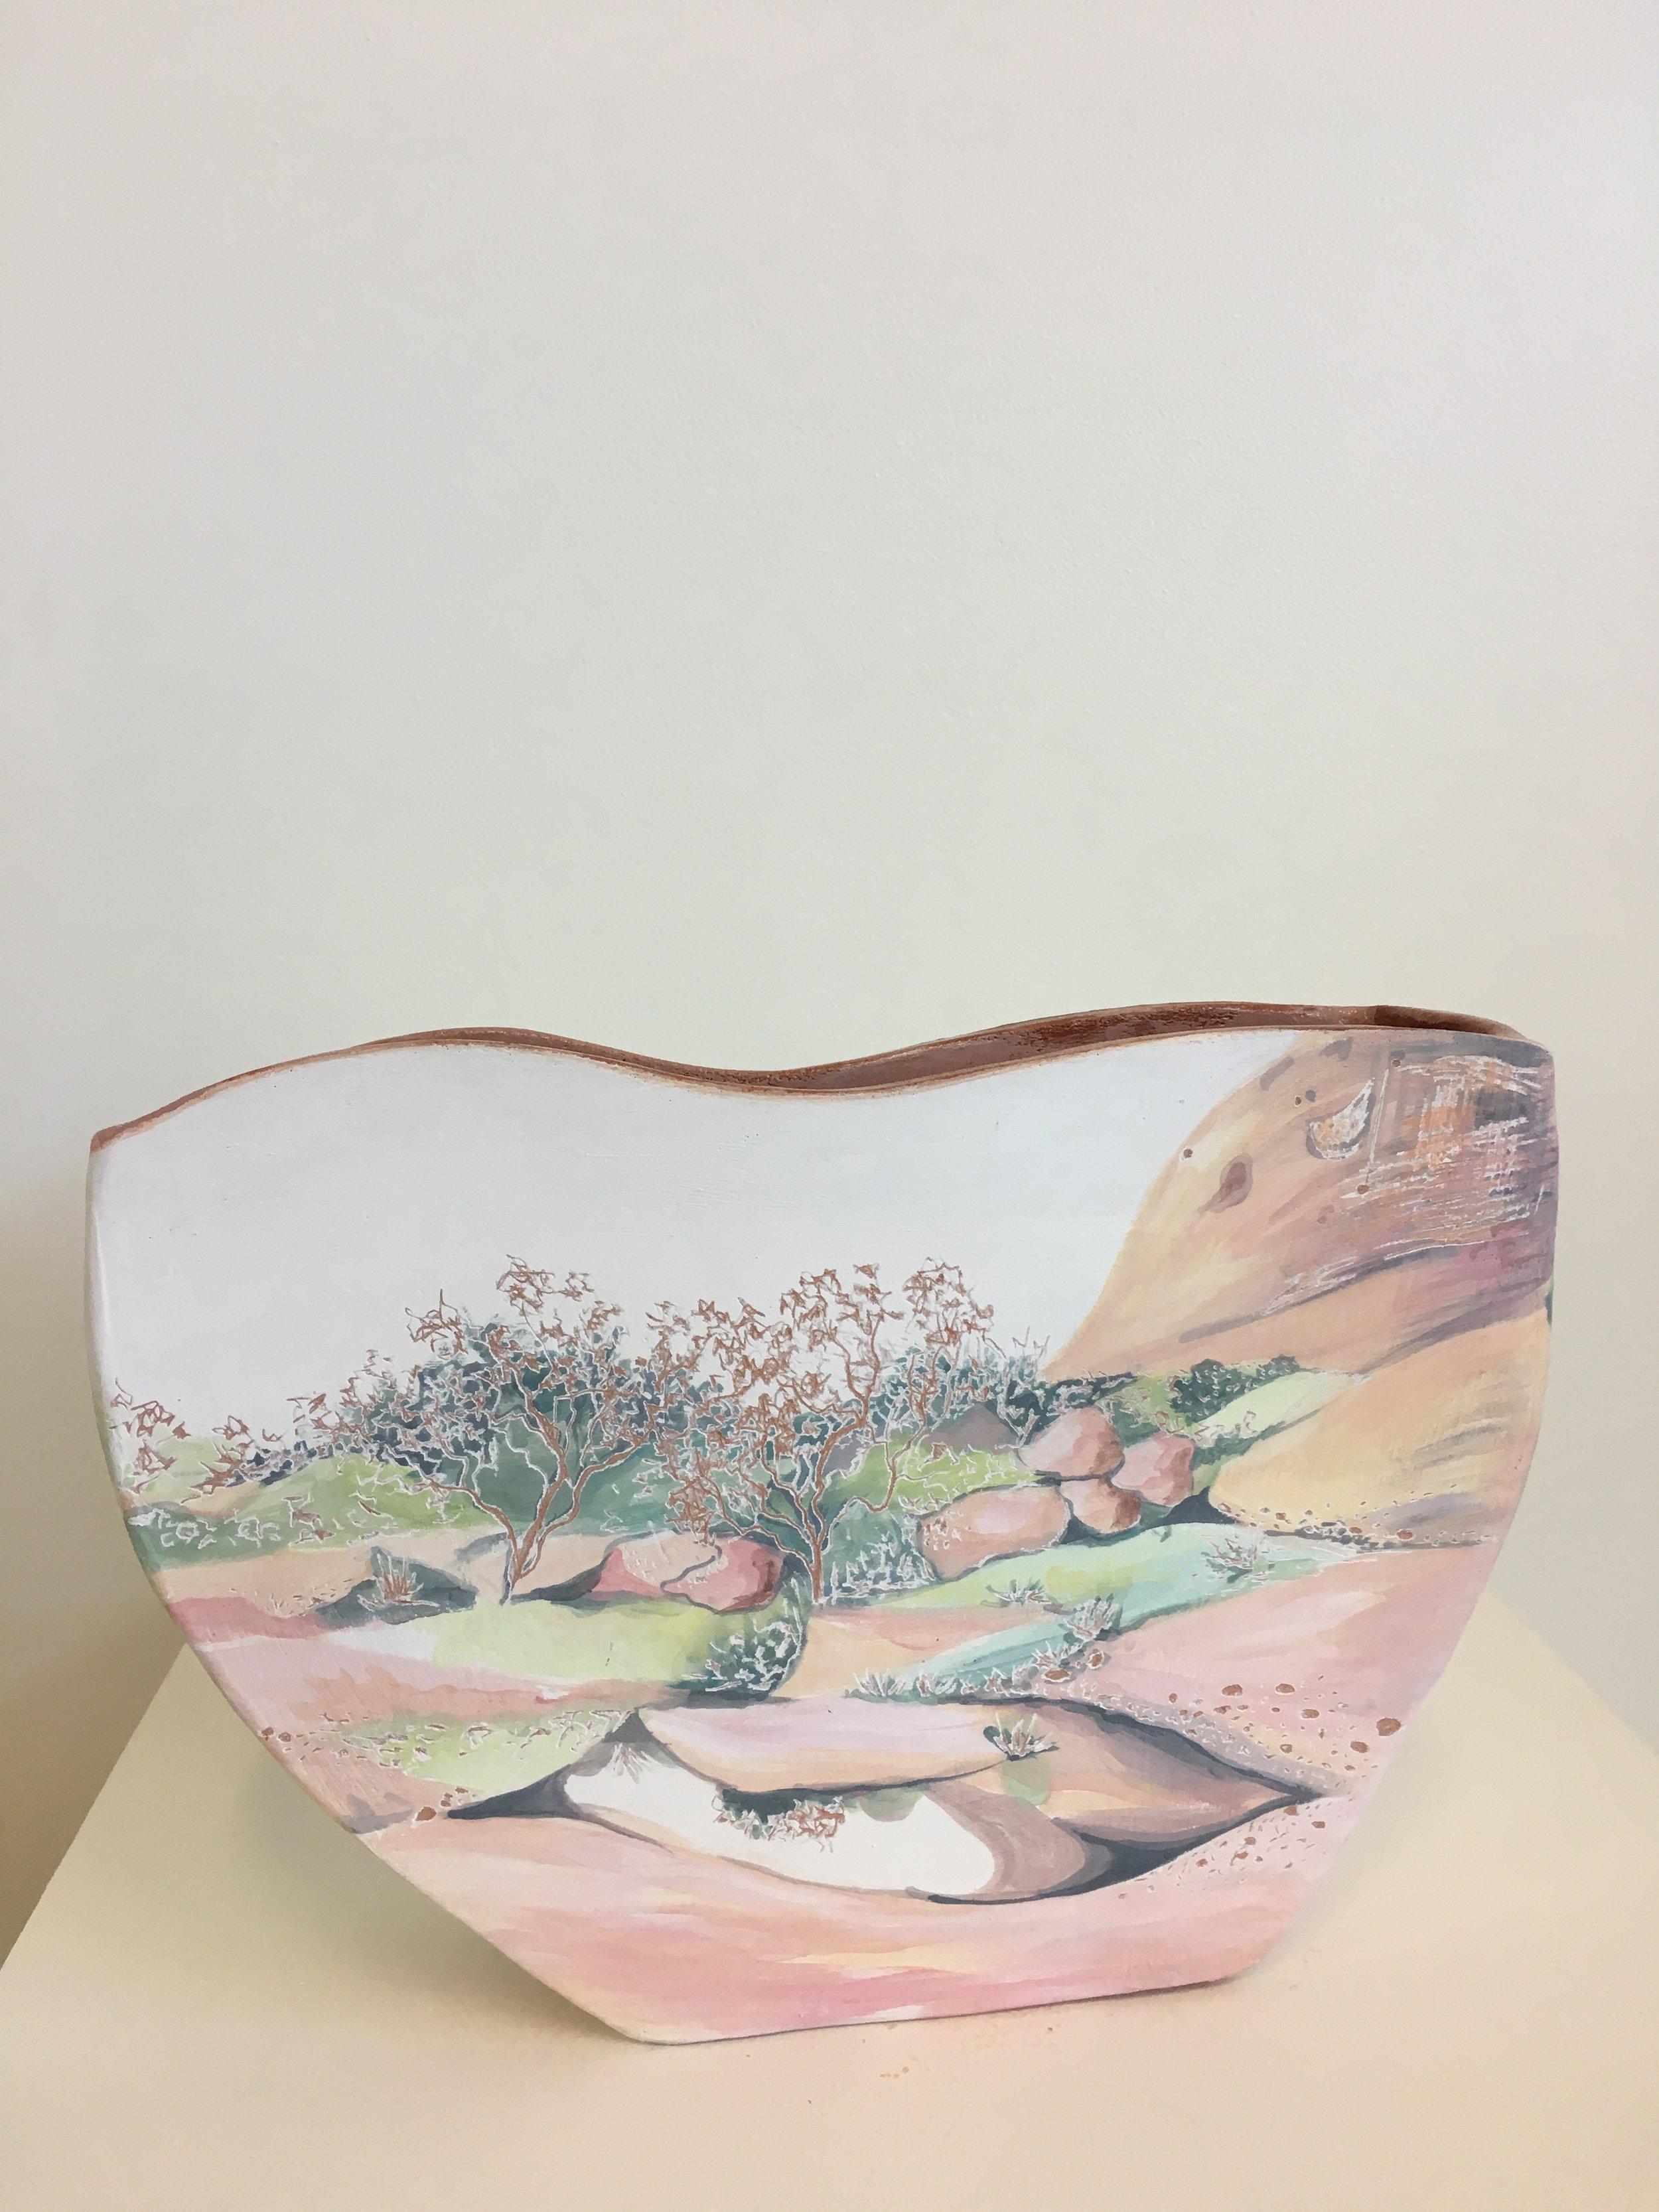 Windy Passage - Kata Tjuta (Front)